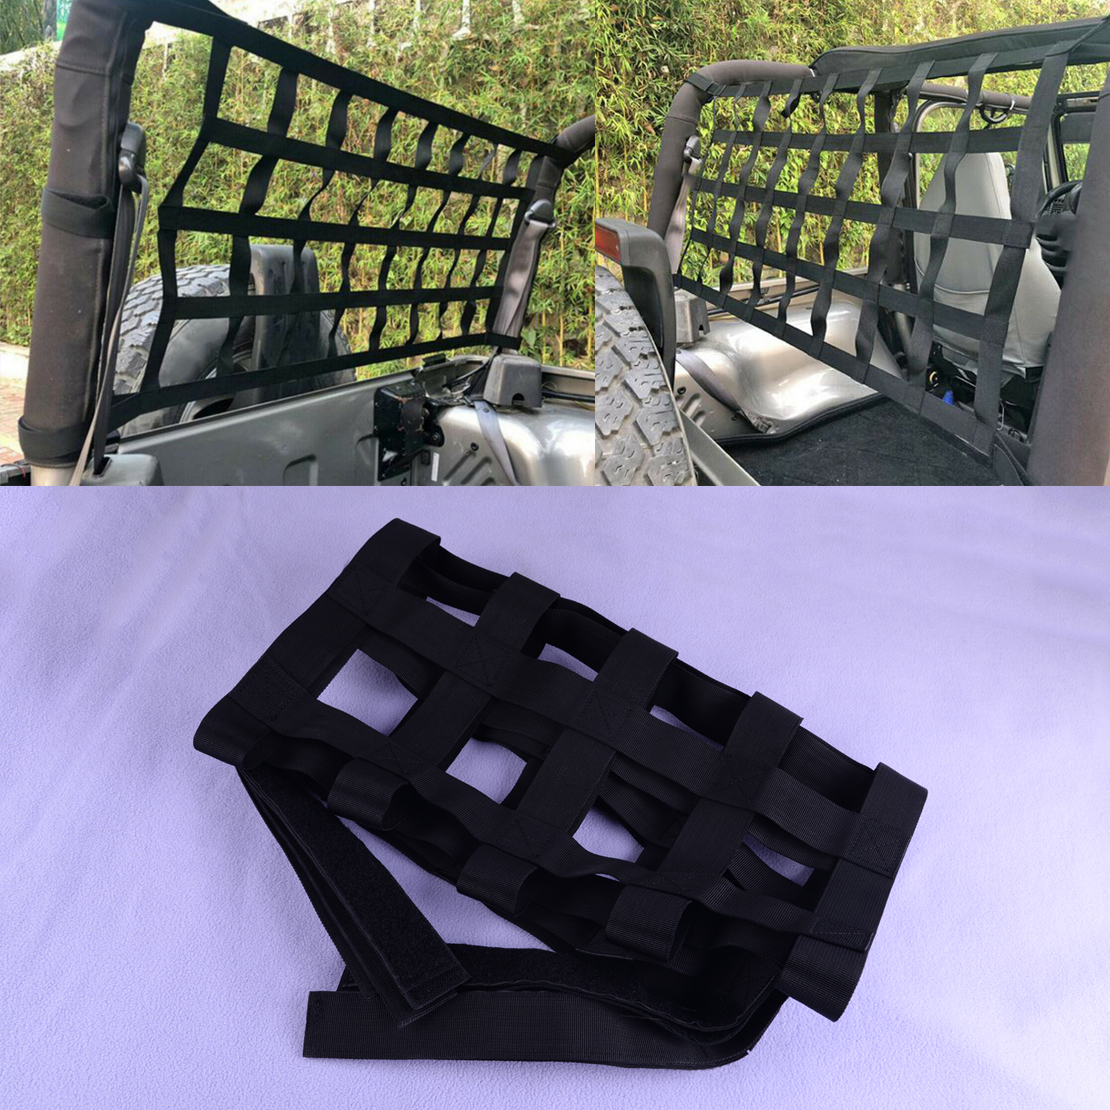 CITALL apto para Jeep Wrangler JK TJ 1997-2012, 2013, 2014, 2015, 2016, 2017 negro ventana Extra para carga de techo neto hamaca de almacenamiento Modelo a escala de 5 uds material de construcción techos de láminas de PVC en tamaño 210x300mm para diseño de la arquitectura